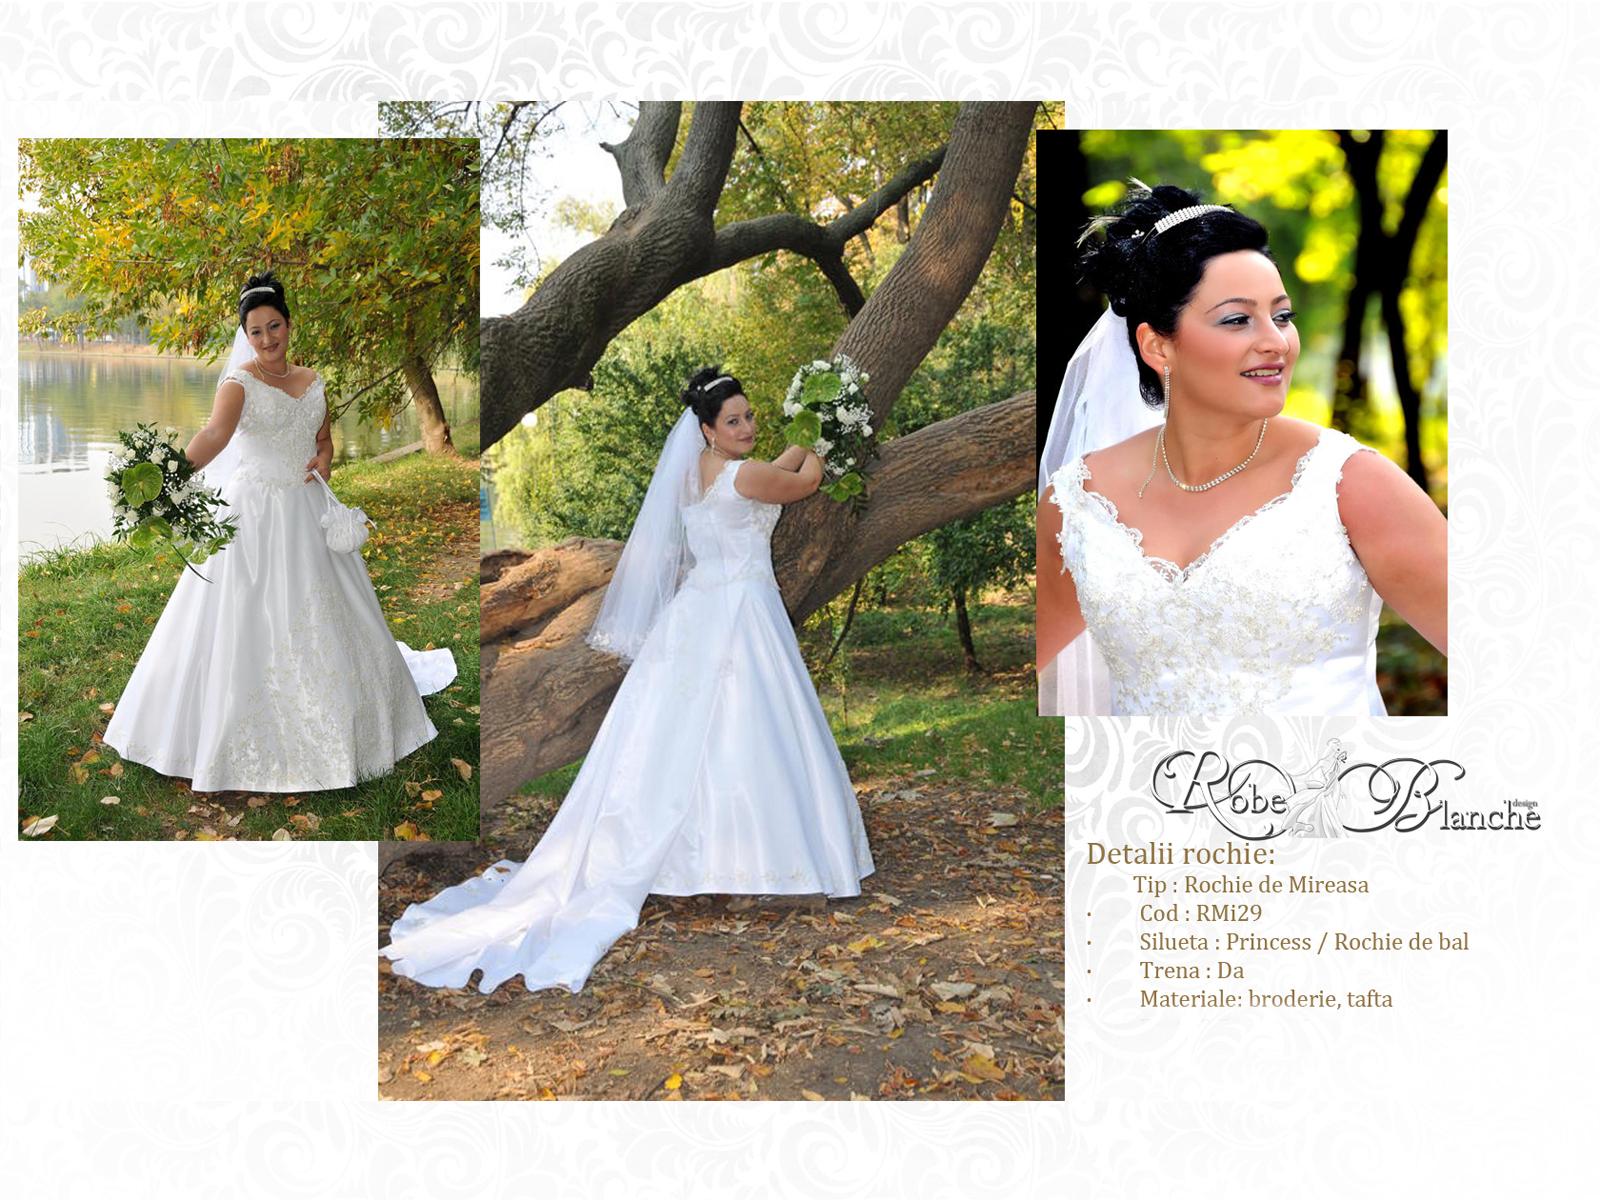 Nunta: Rochia de mireasa: 4 femei, 4 povesti, o rochie